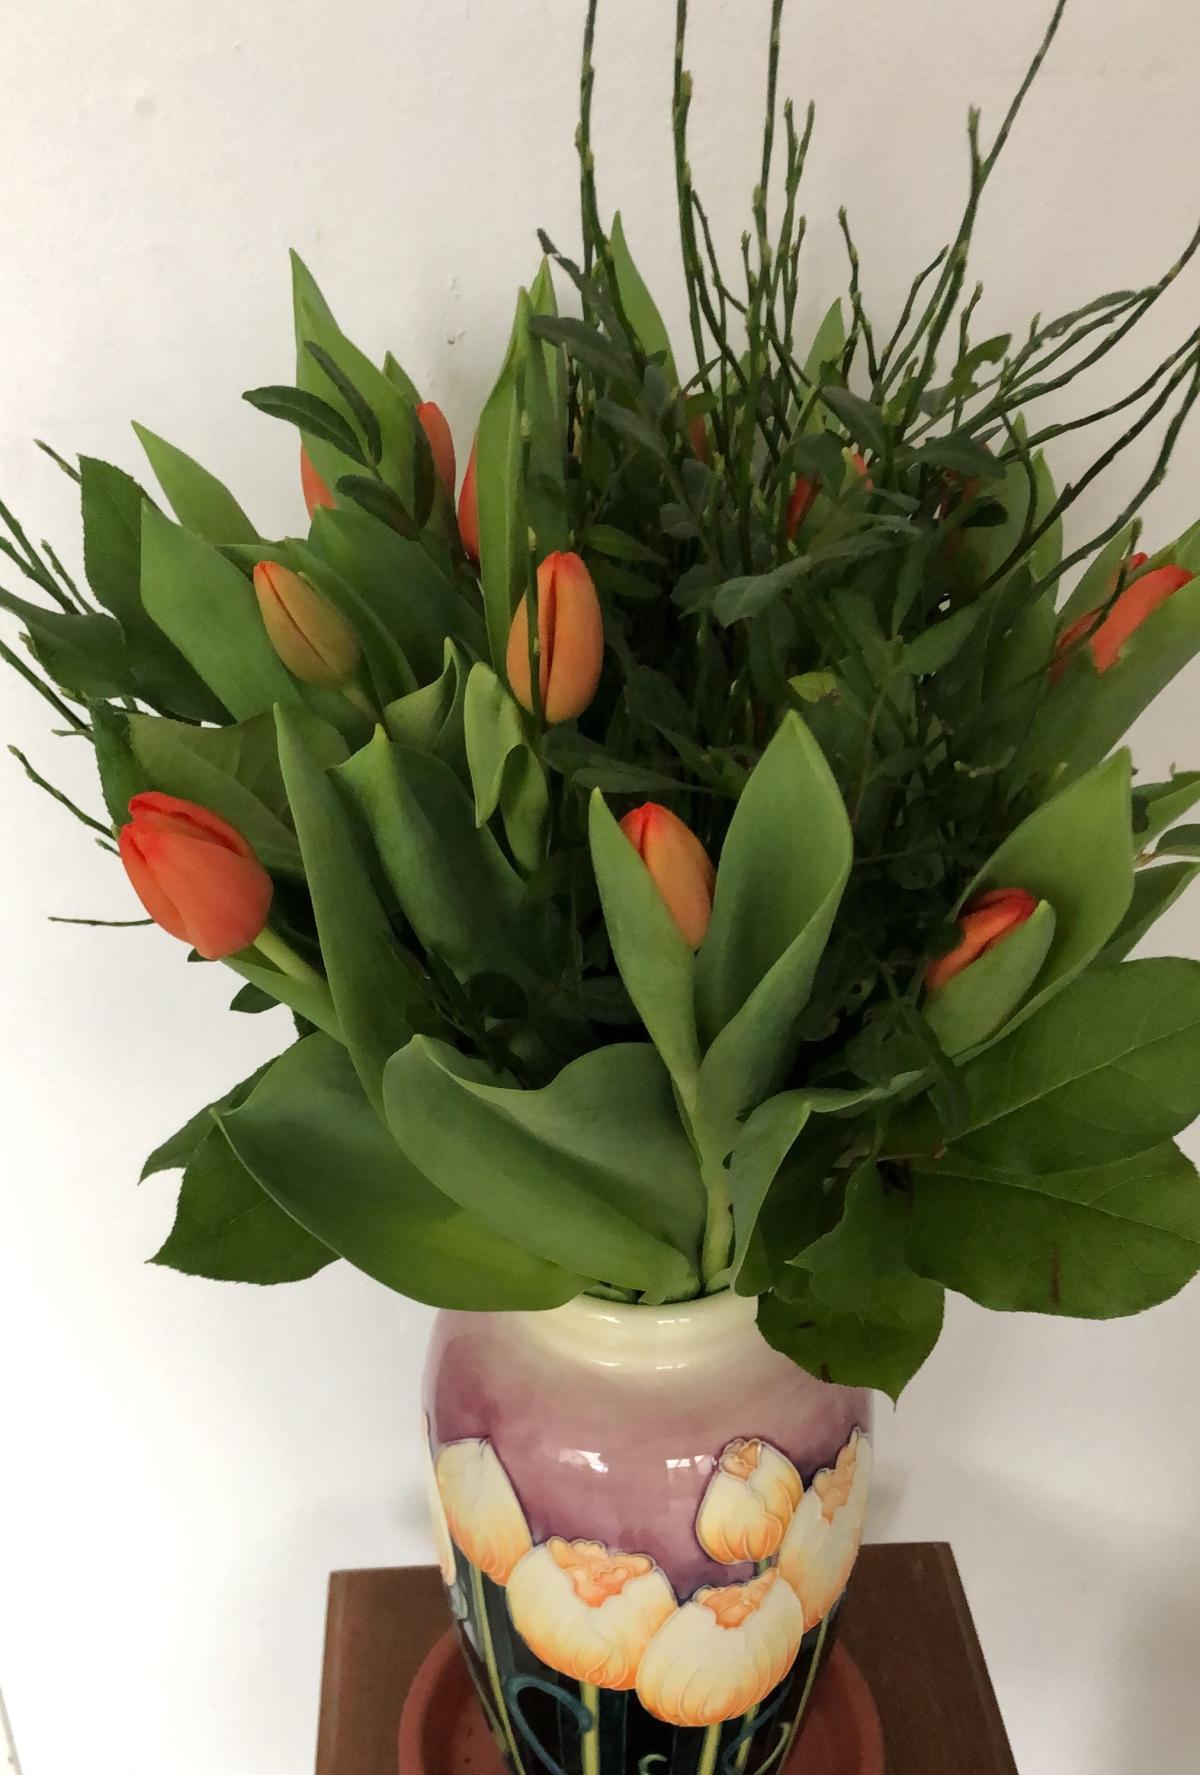 My tulips on Thursday